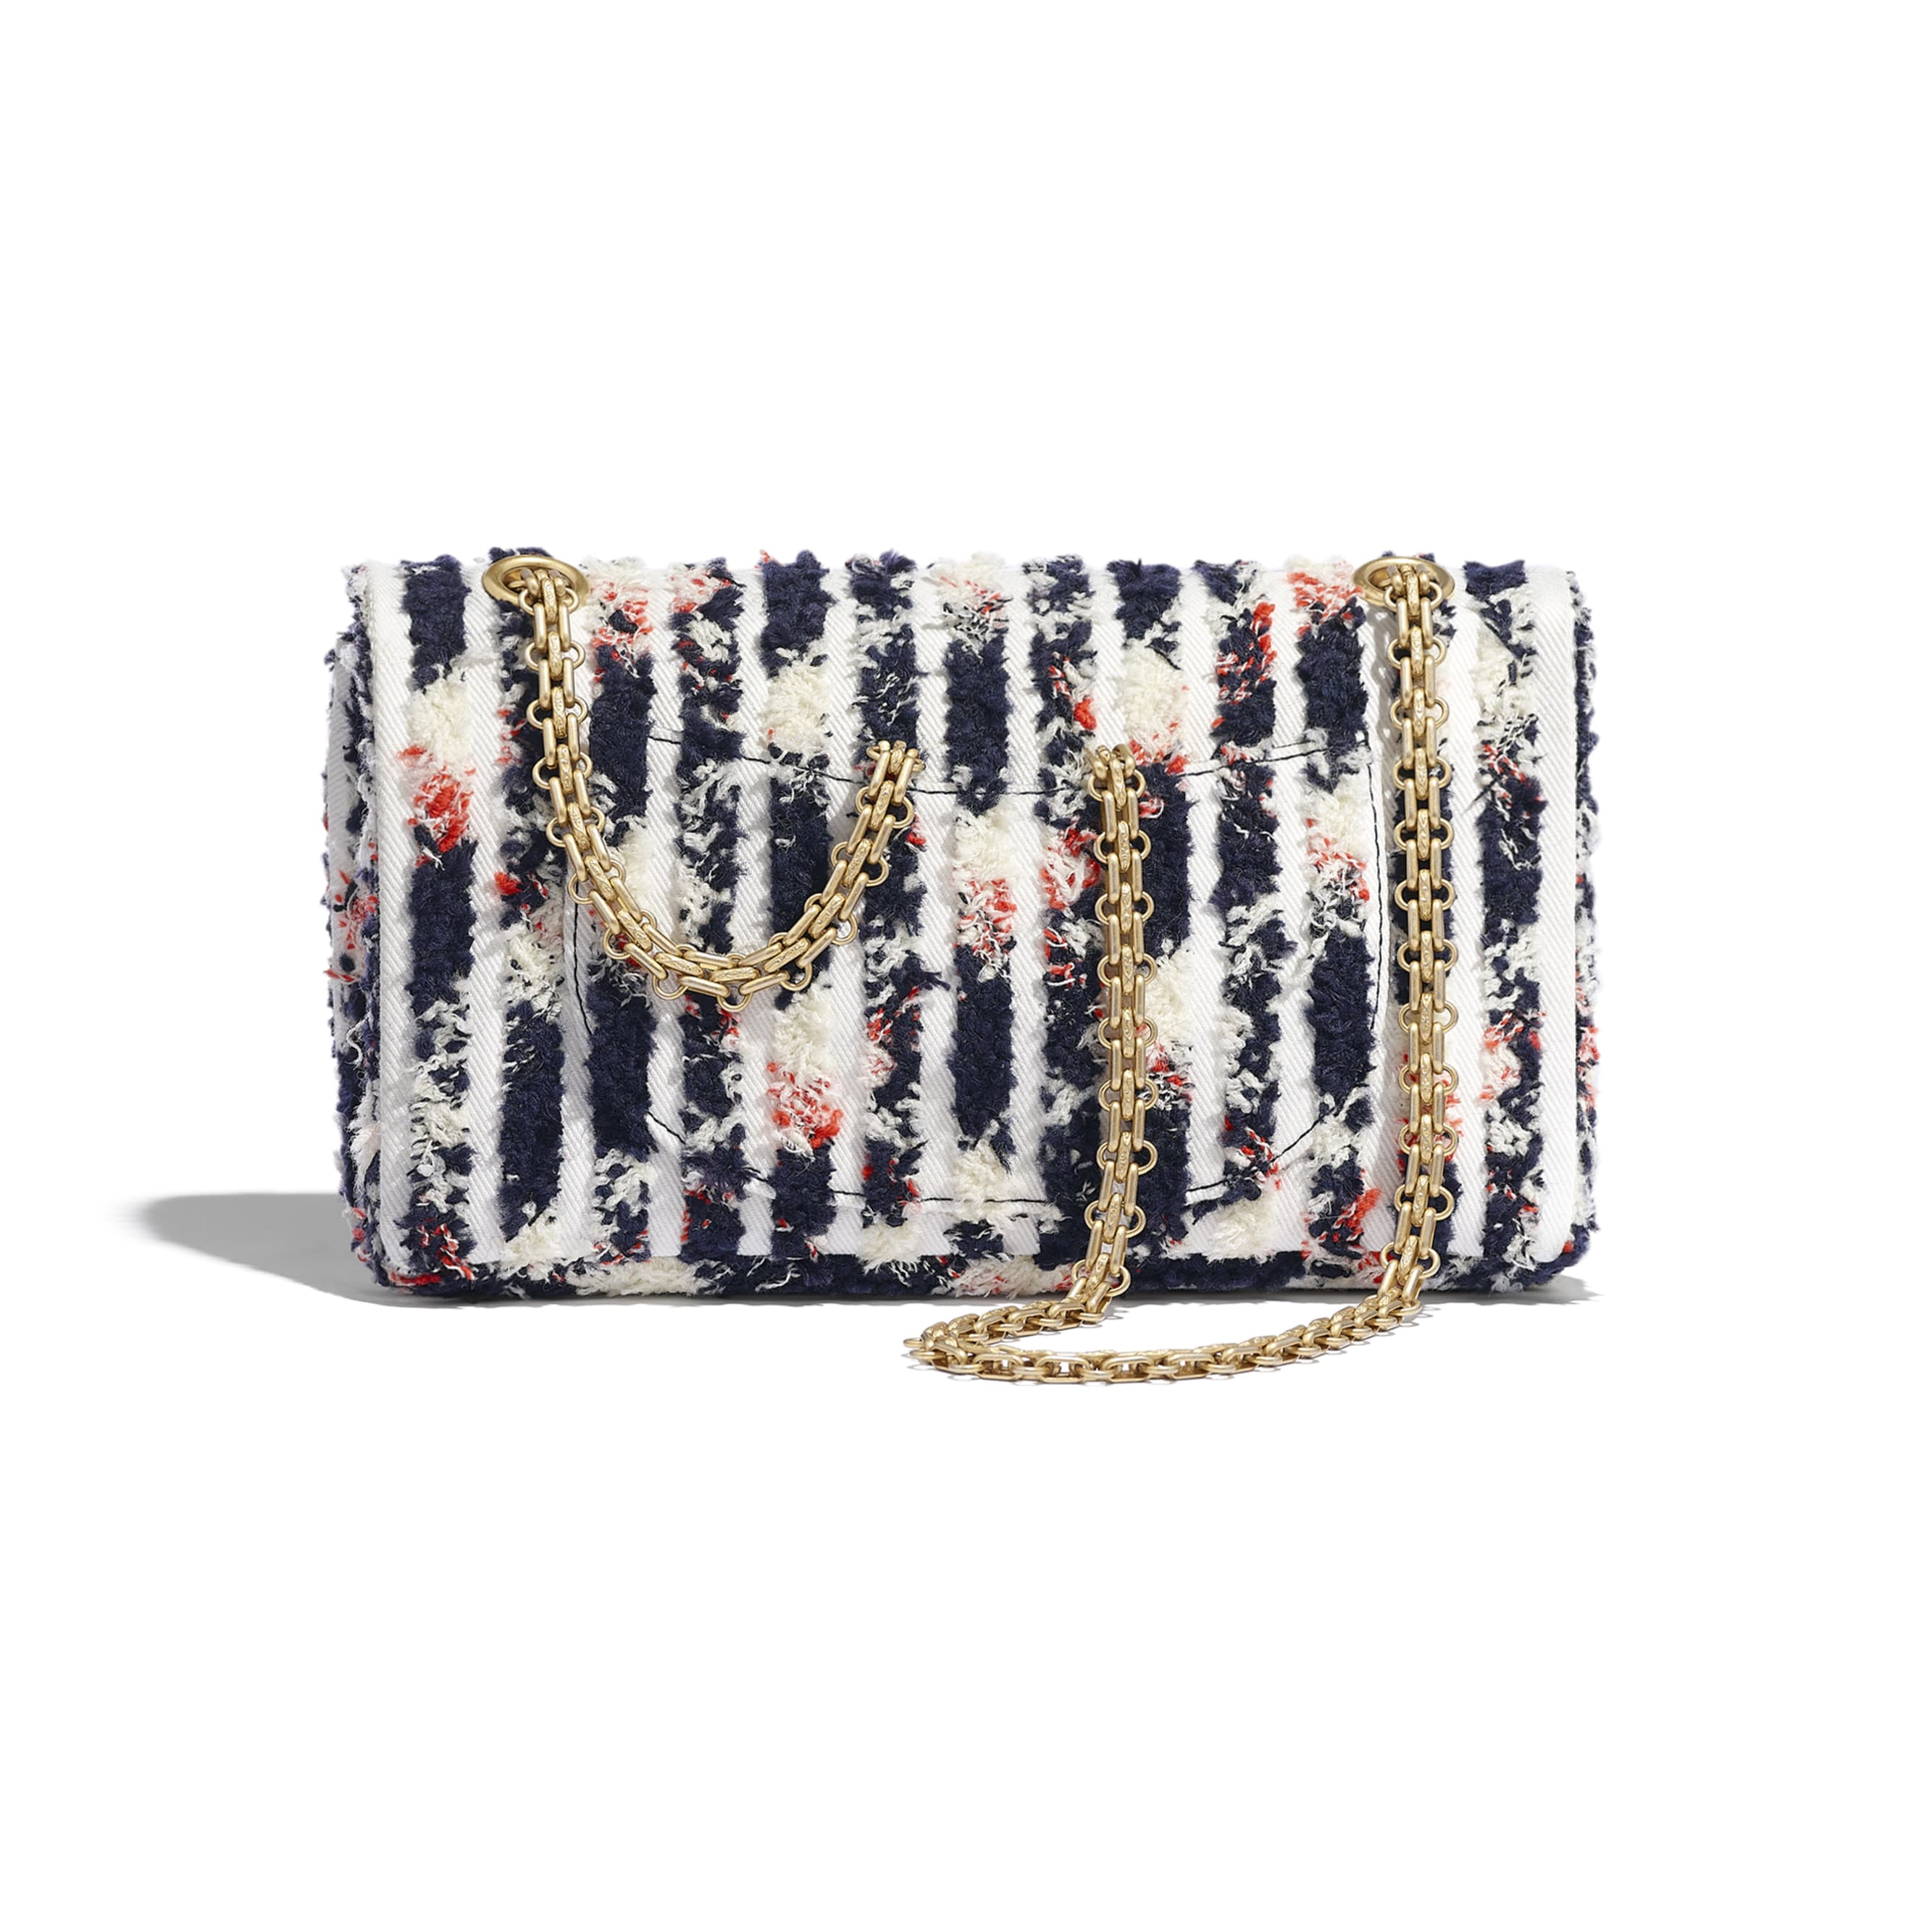 2.55 Handbag - Ecru, Navy Blue, Orange & White - Wool Tweed, Denim & Gold-Tone Metal - Alternative view - see standard sized version